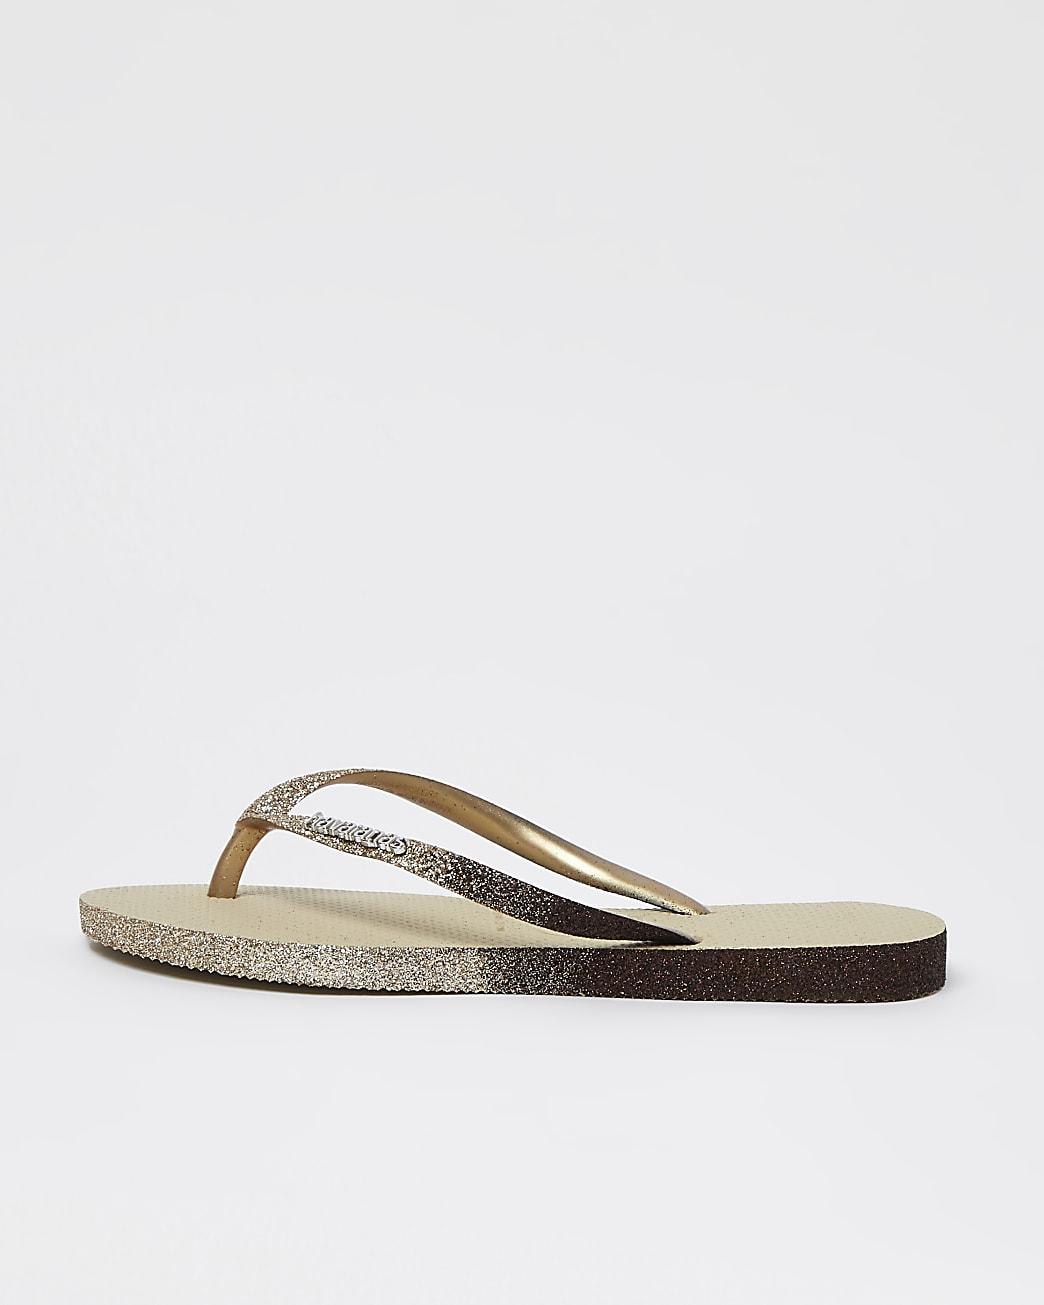 Havaianas grey slim flip flops